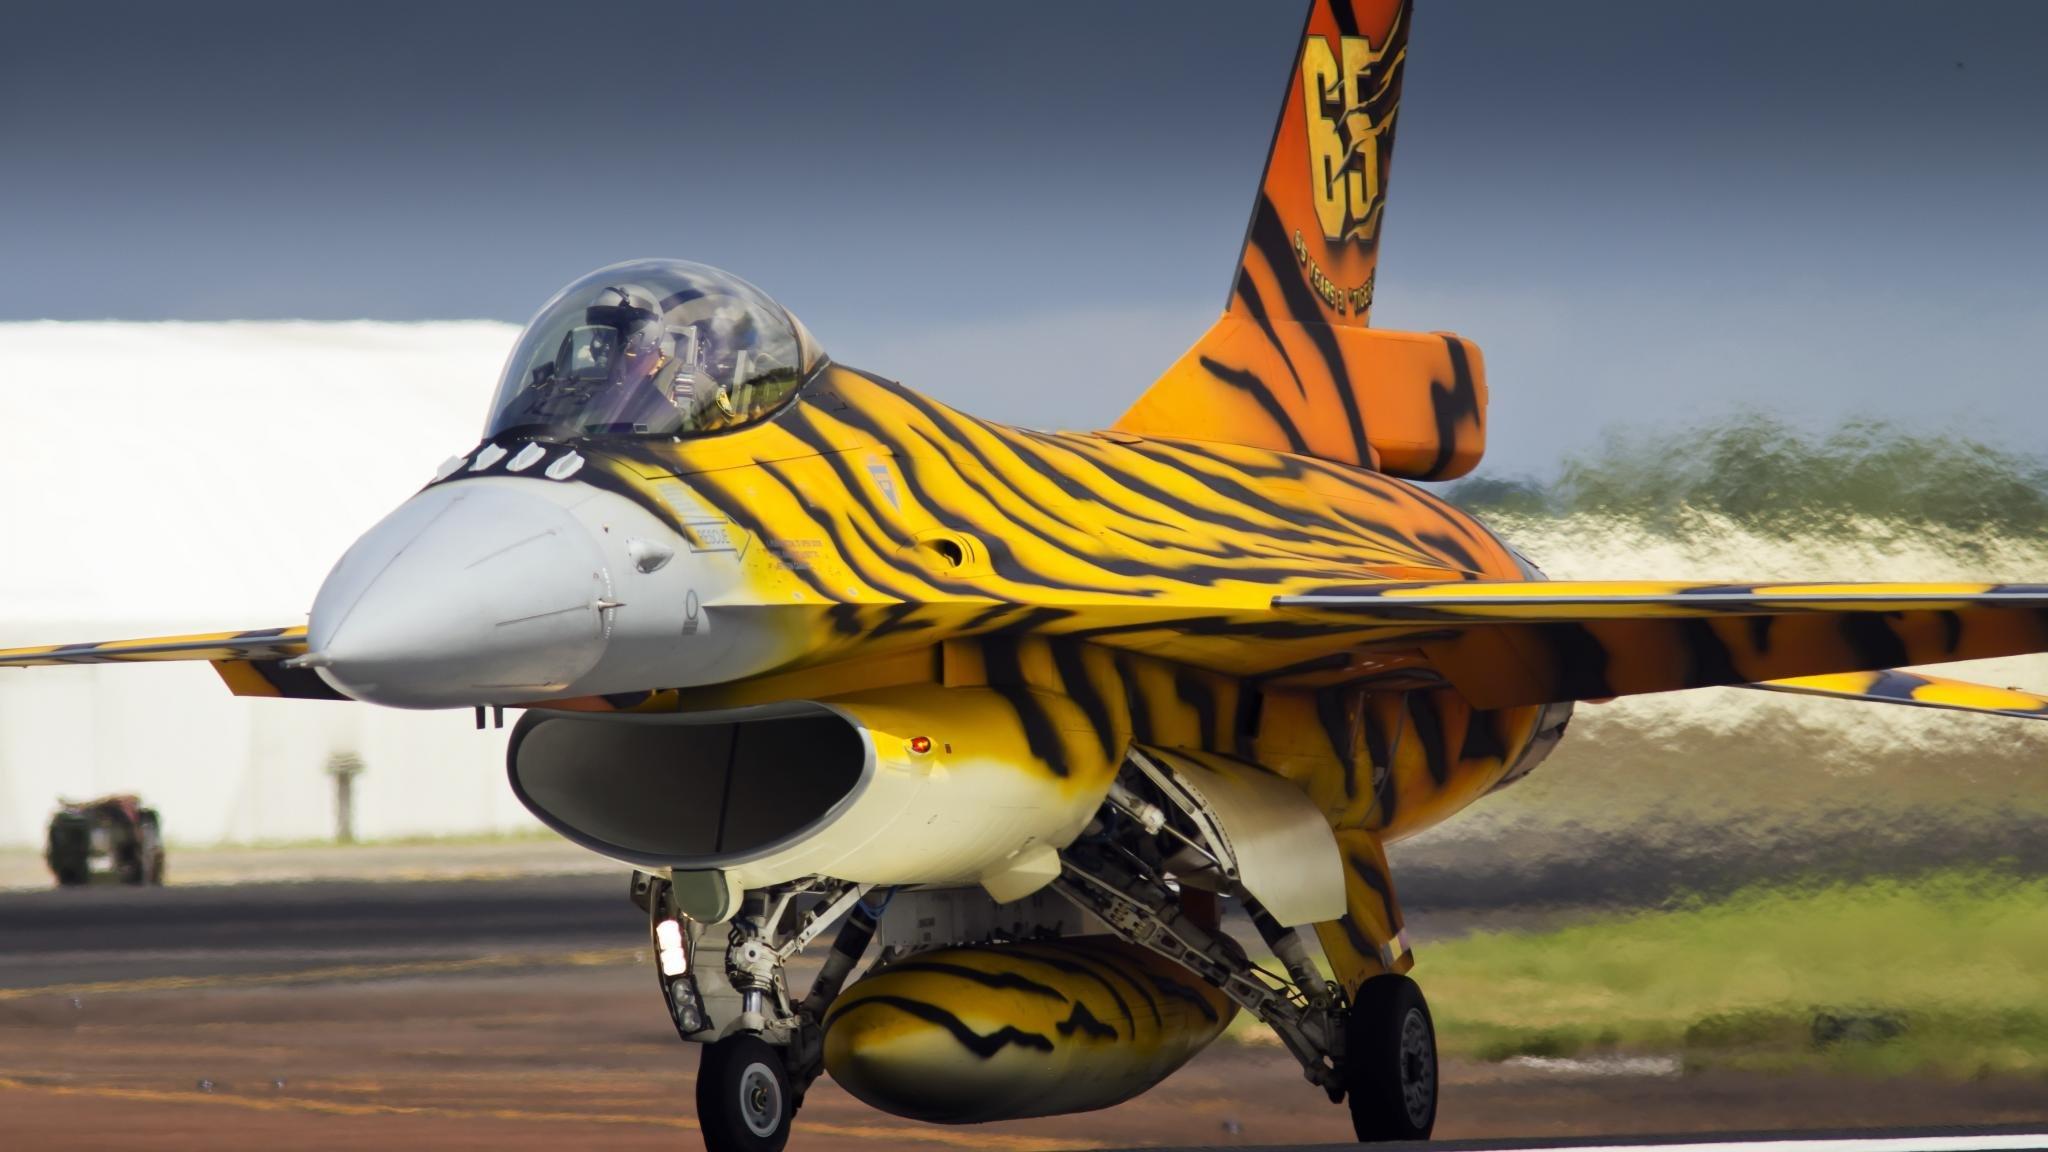 High Resolution General Dynamics F 16 Fighting Falcon Hd 2048x1152 Wallpaper Id 175101 For Desktop